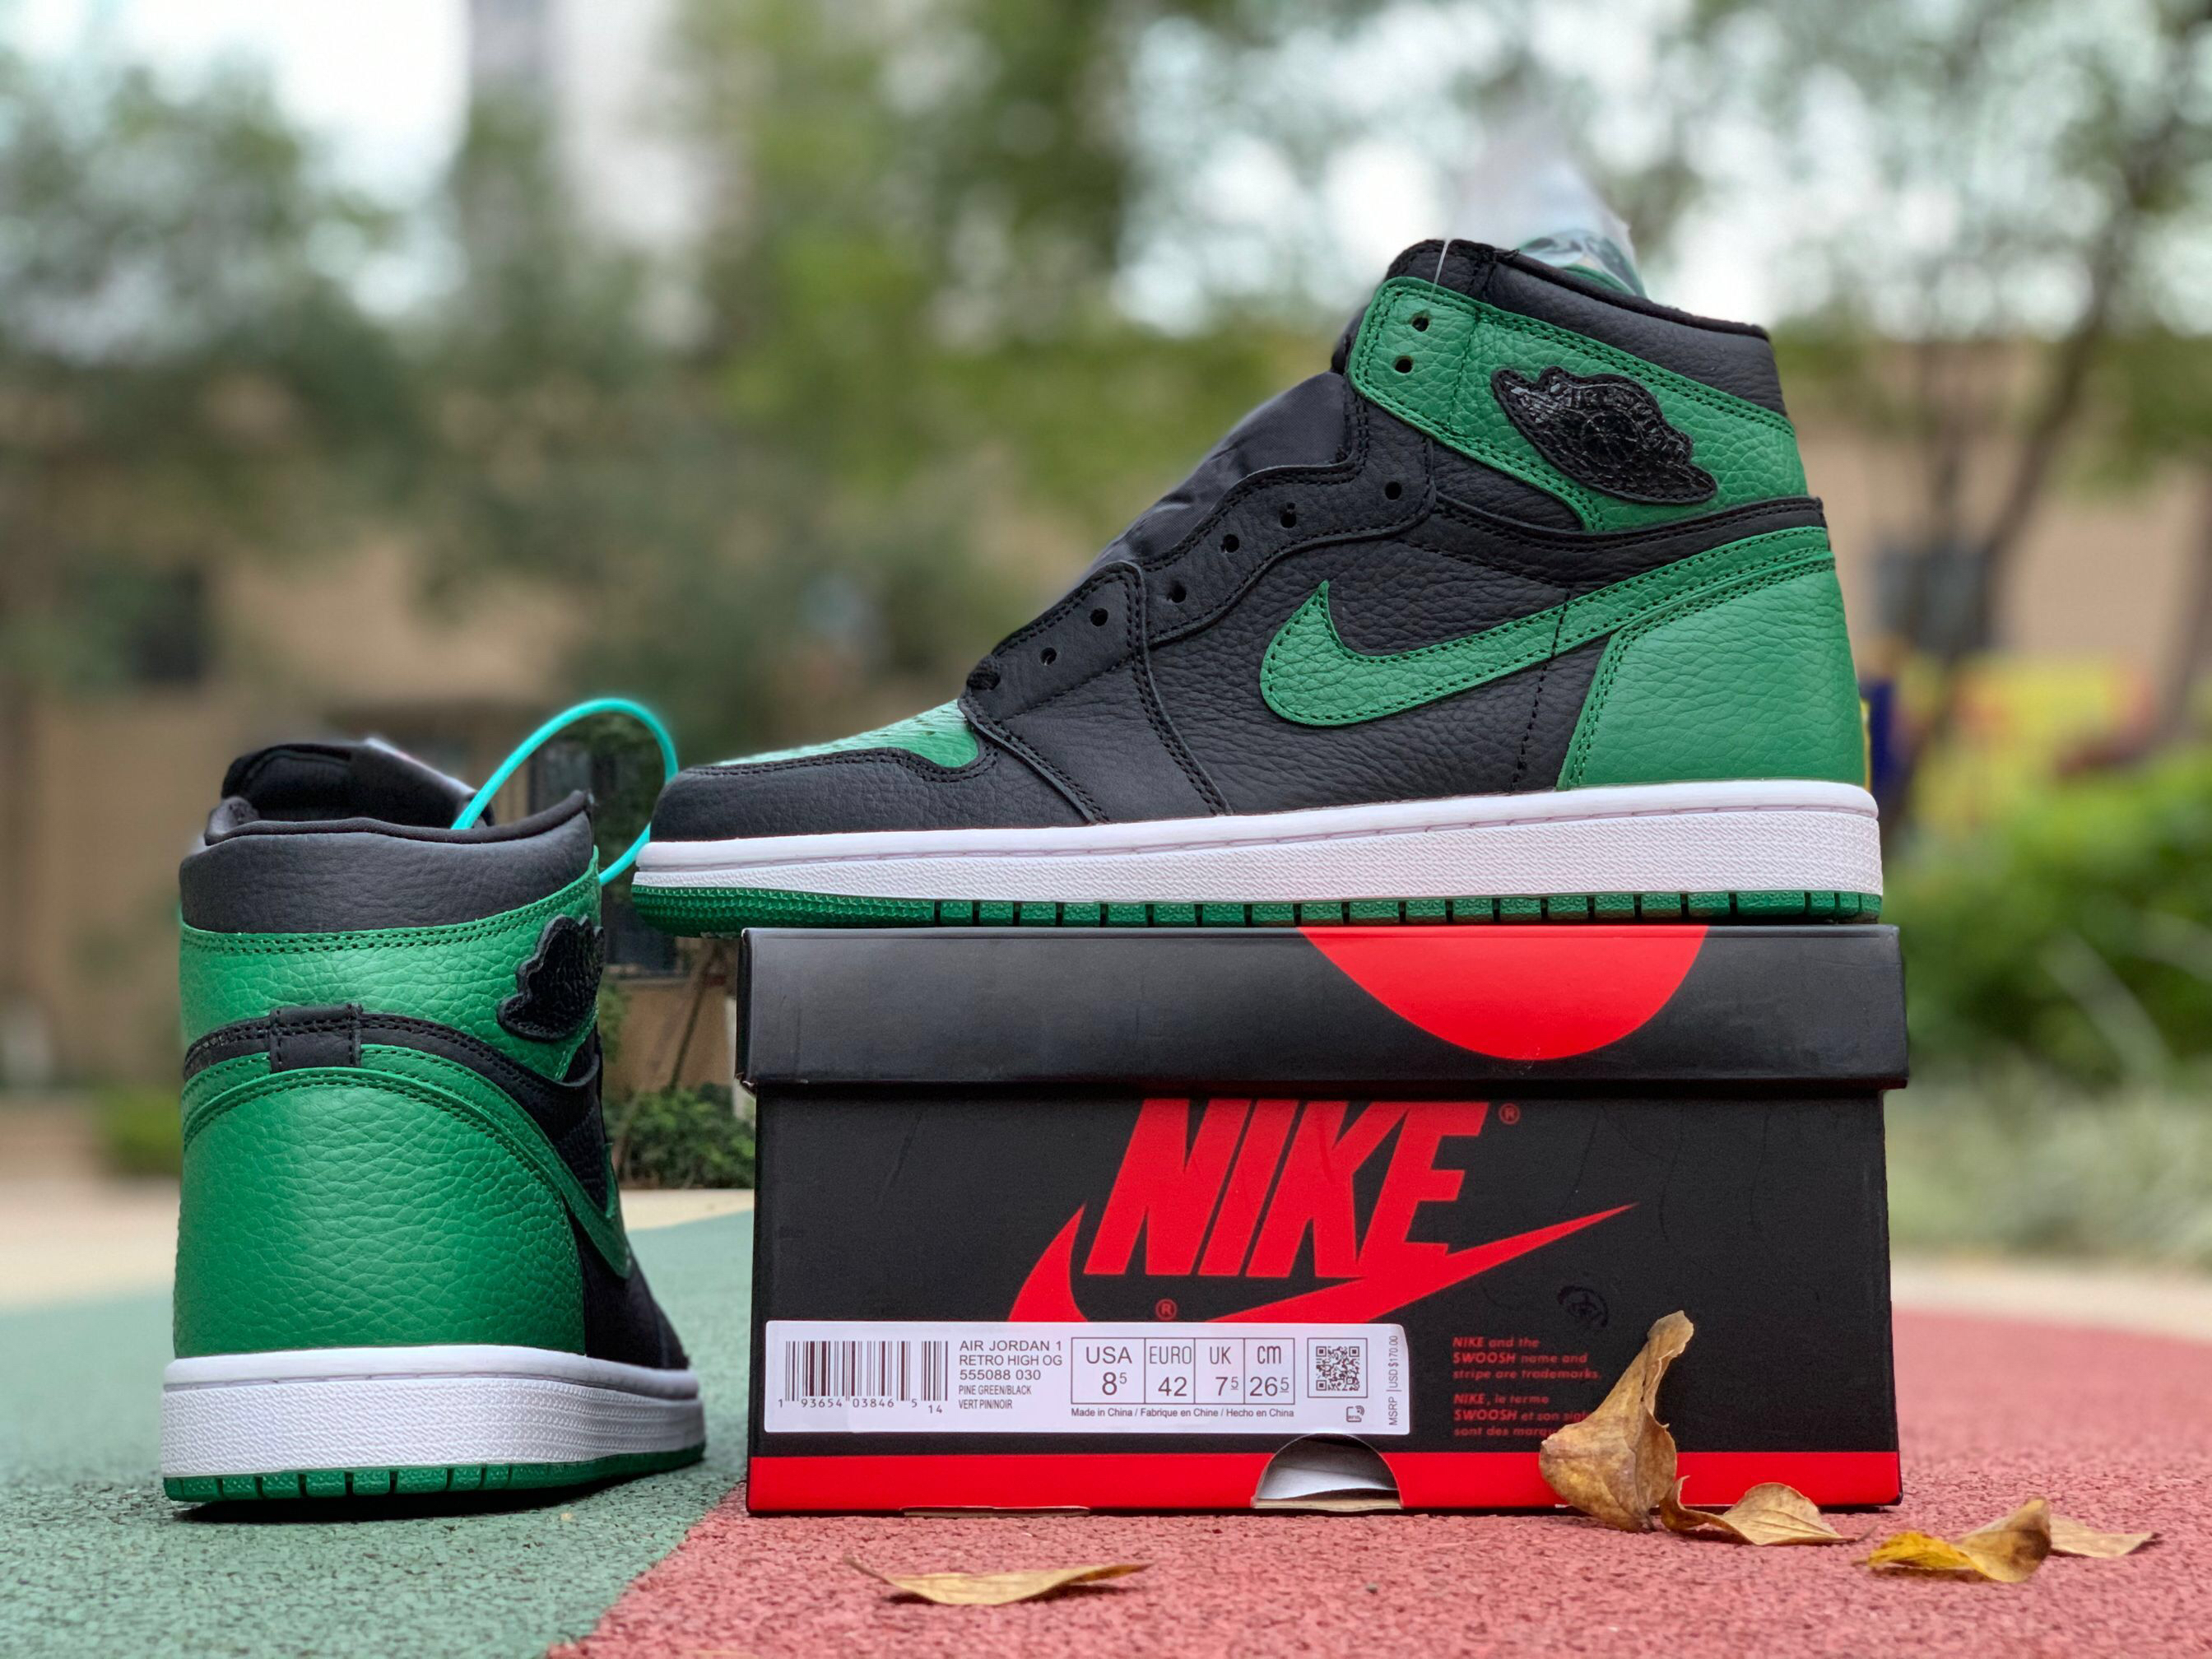 Air Jordan - $200 - Size 8